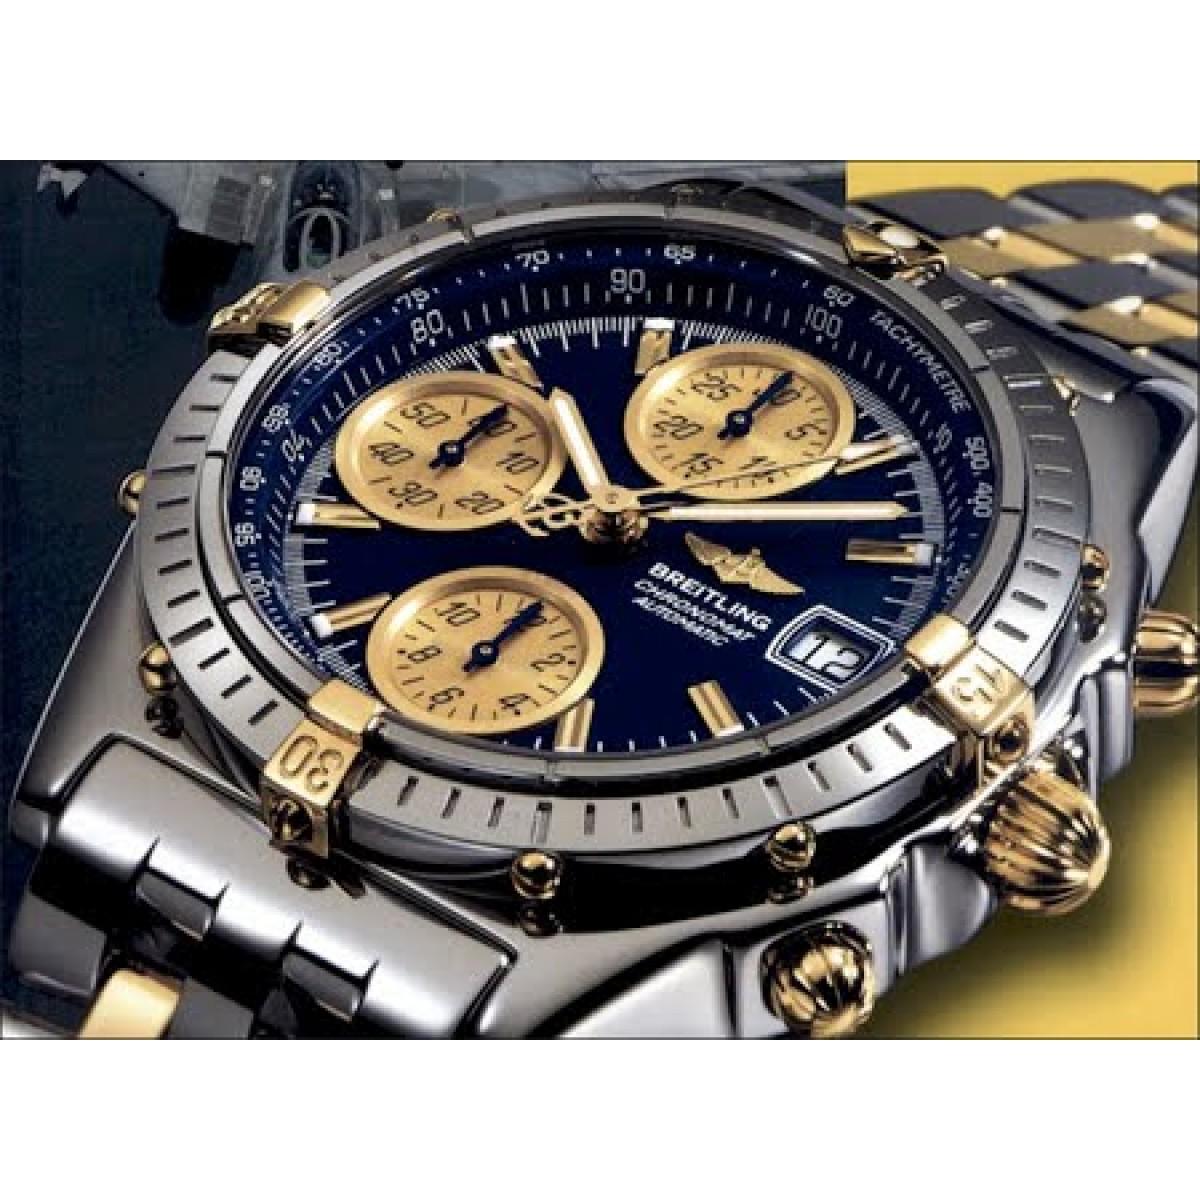 b6c895ad0be Relógio Breitling Chronomath  Relógio Breitling Chronomath